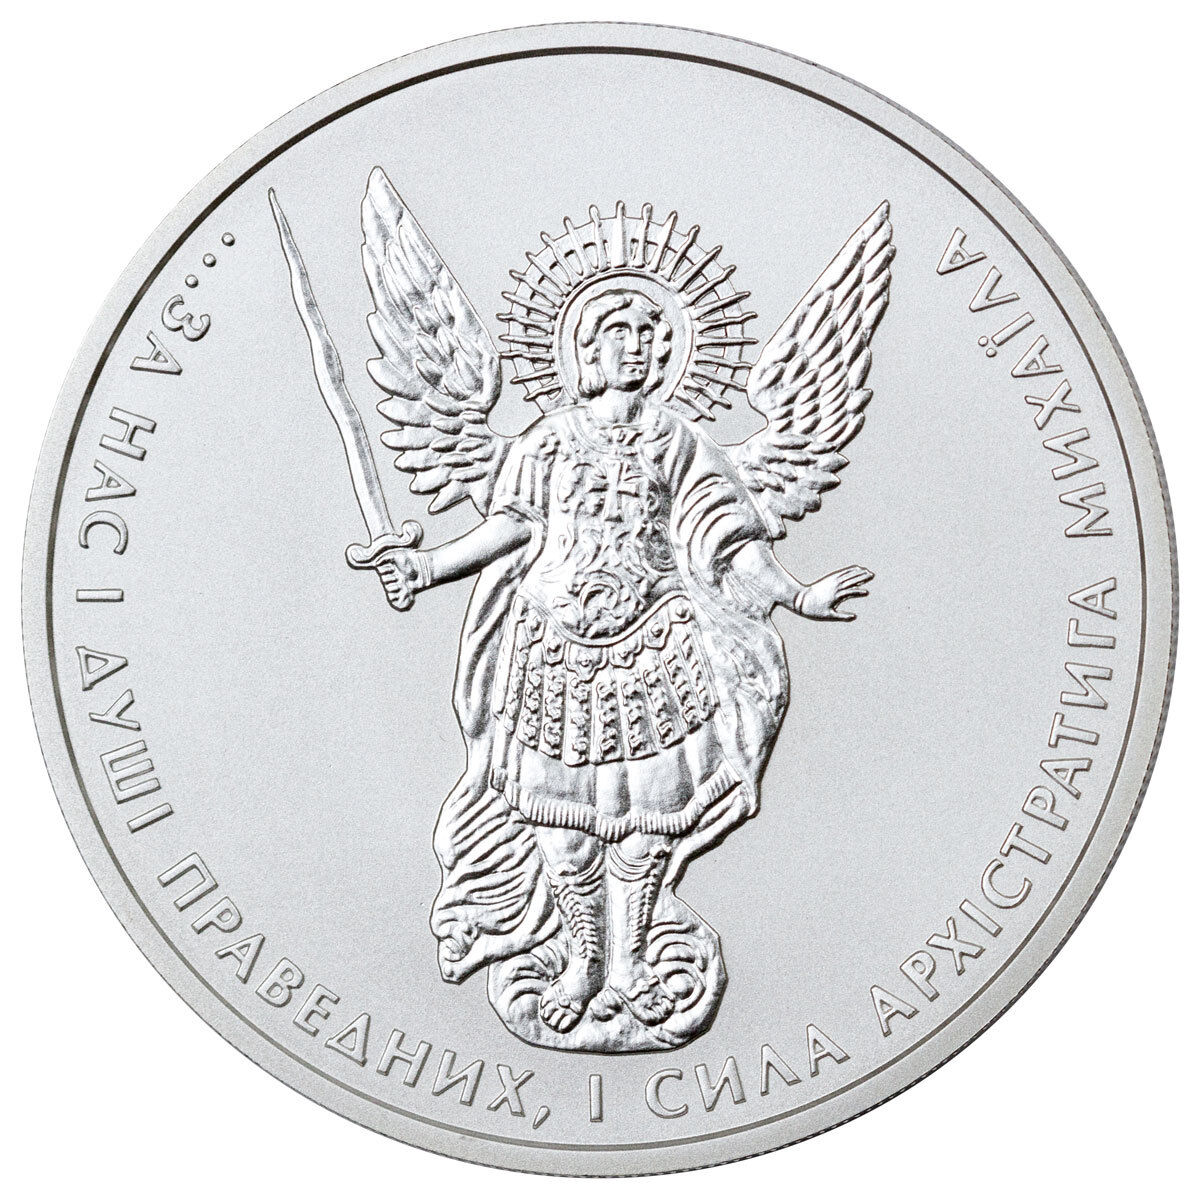 2015 Ukraine 1 oz. Silver Archangel Michael Coin BU SKU46335